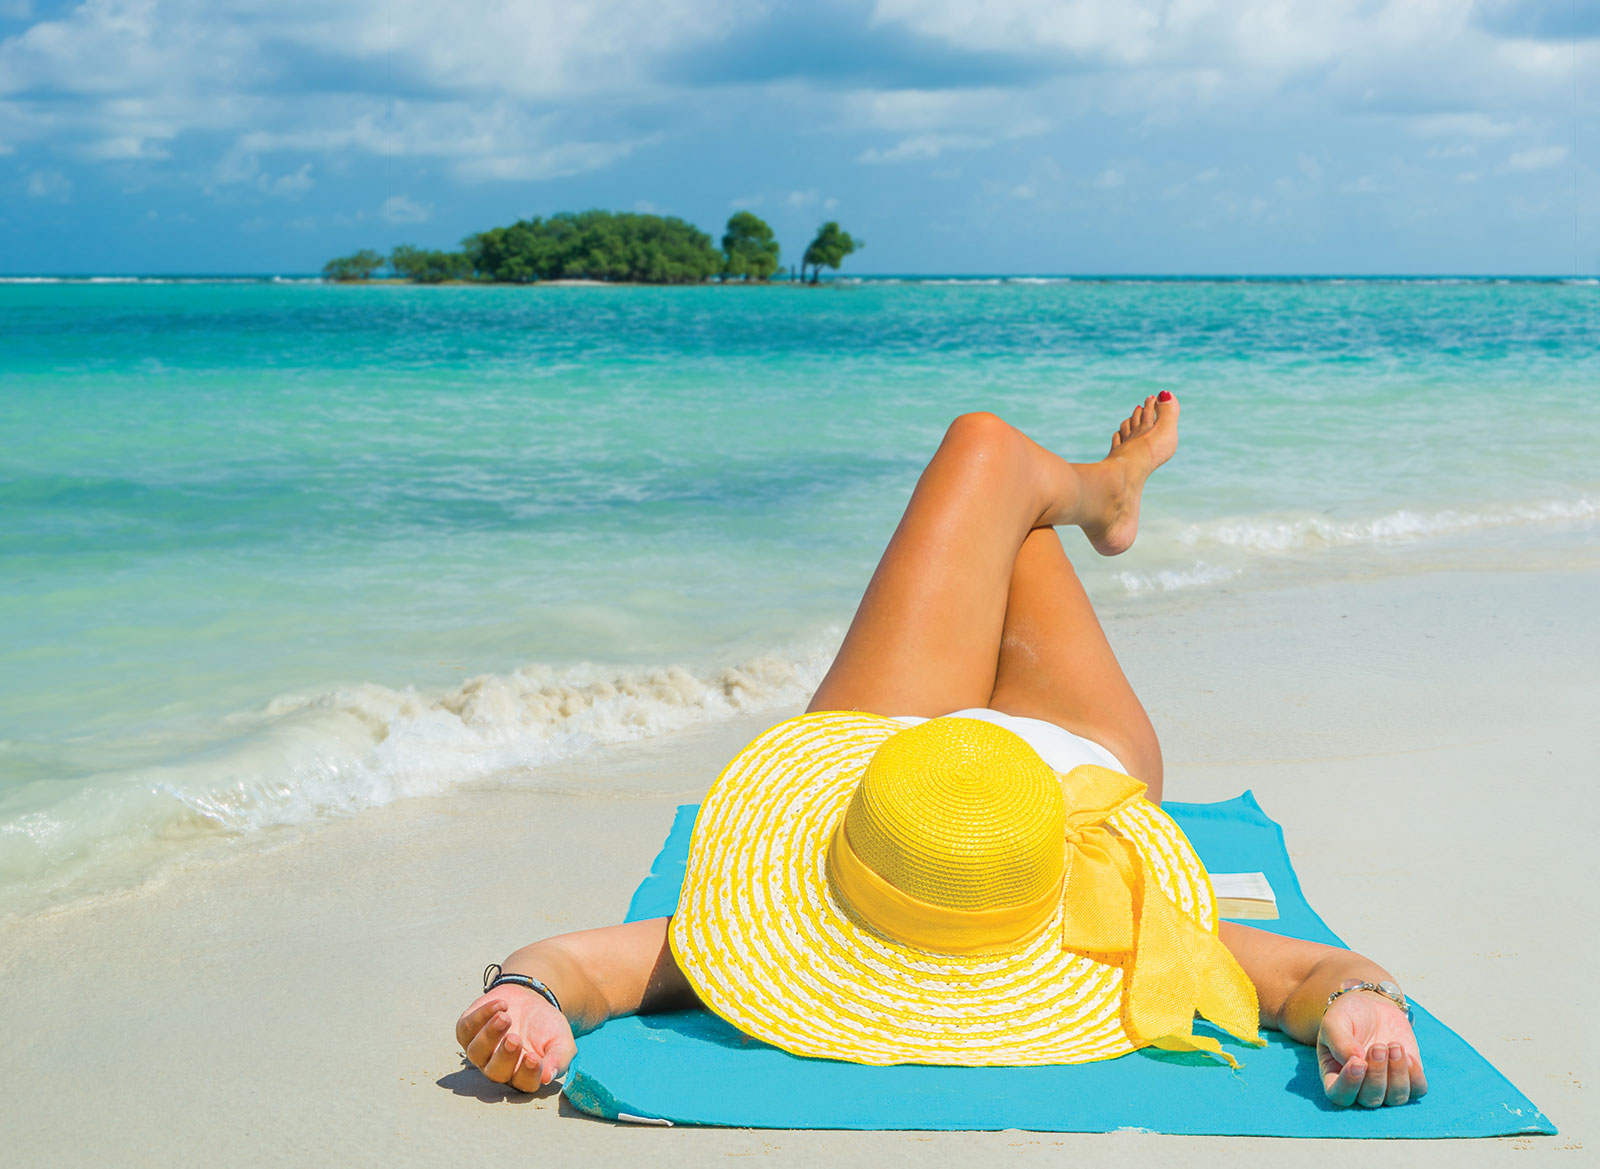 лето пляж жара фото осанка, уверенный